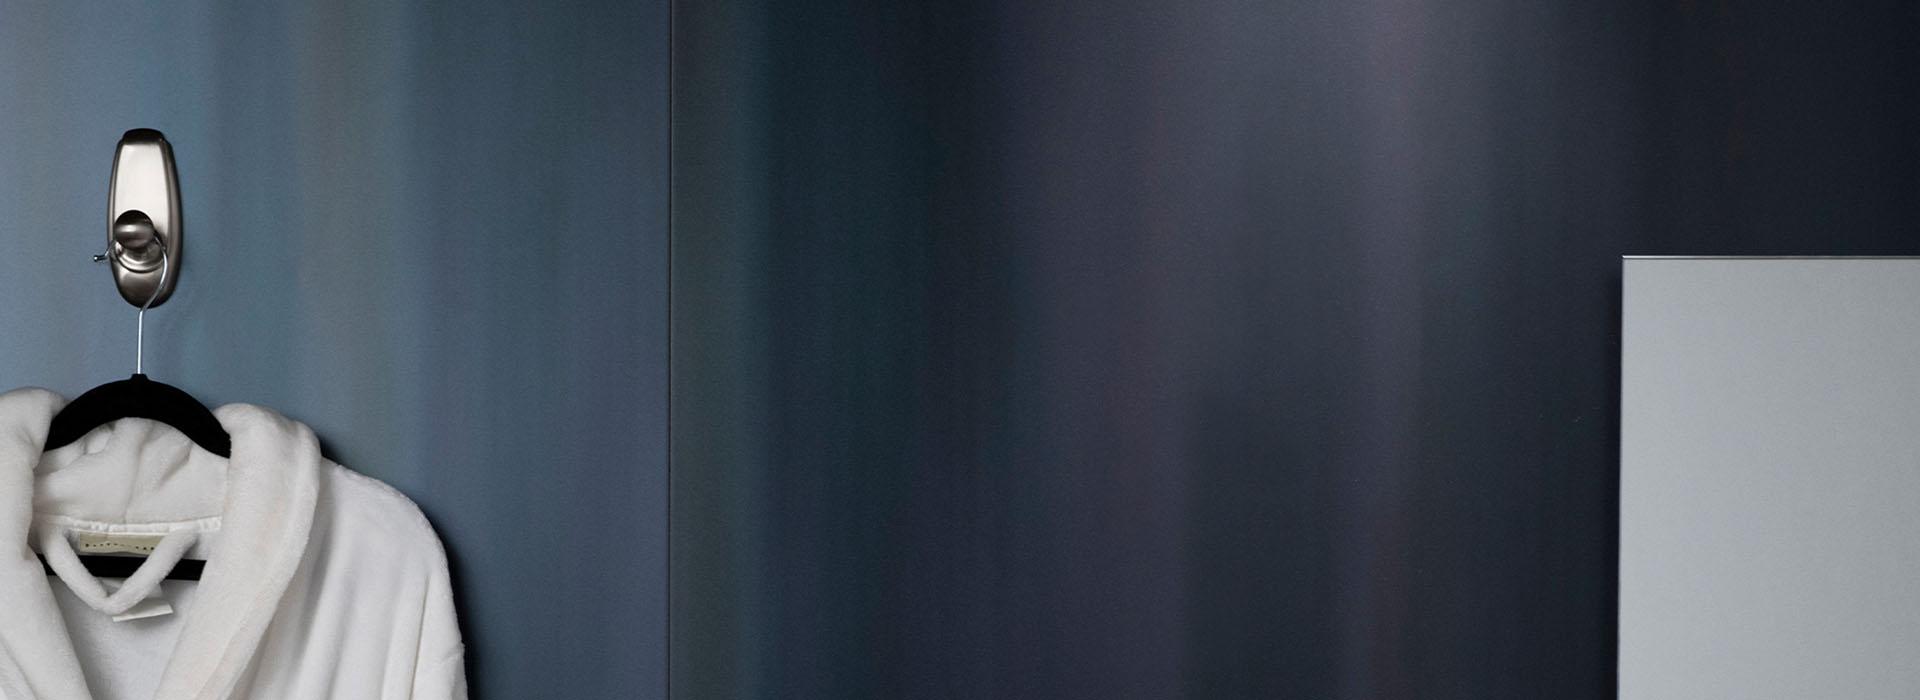 M9421 Dark Rolled Steel hotel suite bathroom with robe